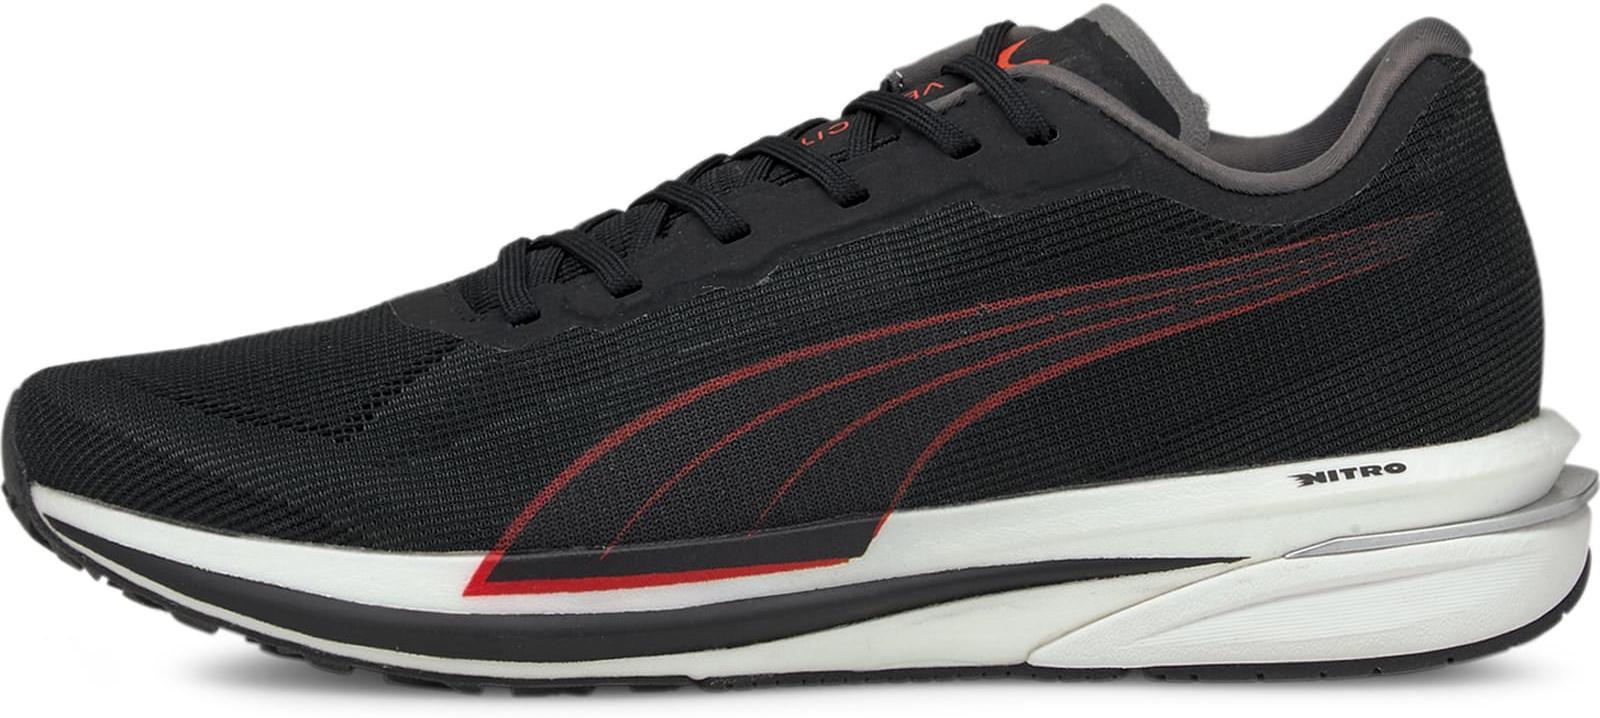 Running shoes Puma Velocity Nitro